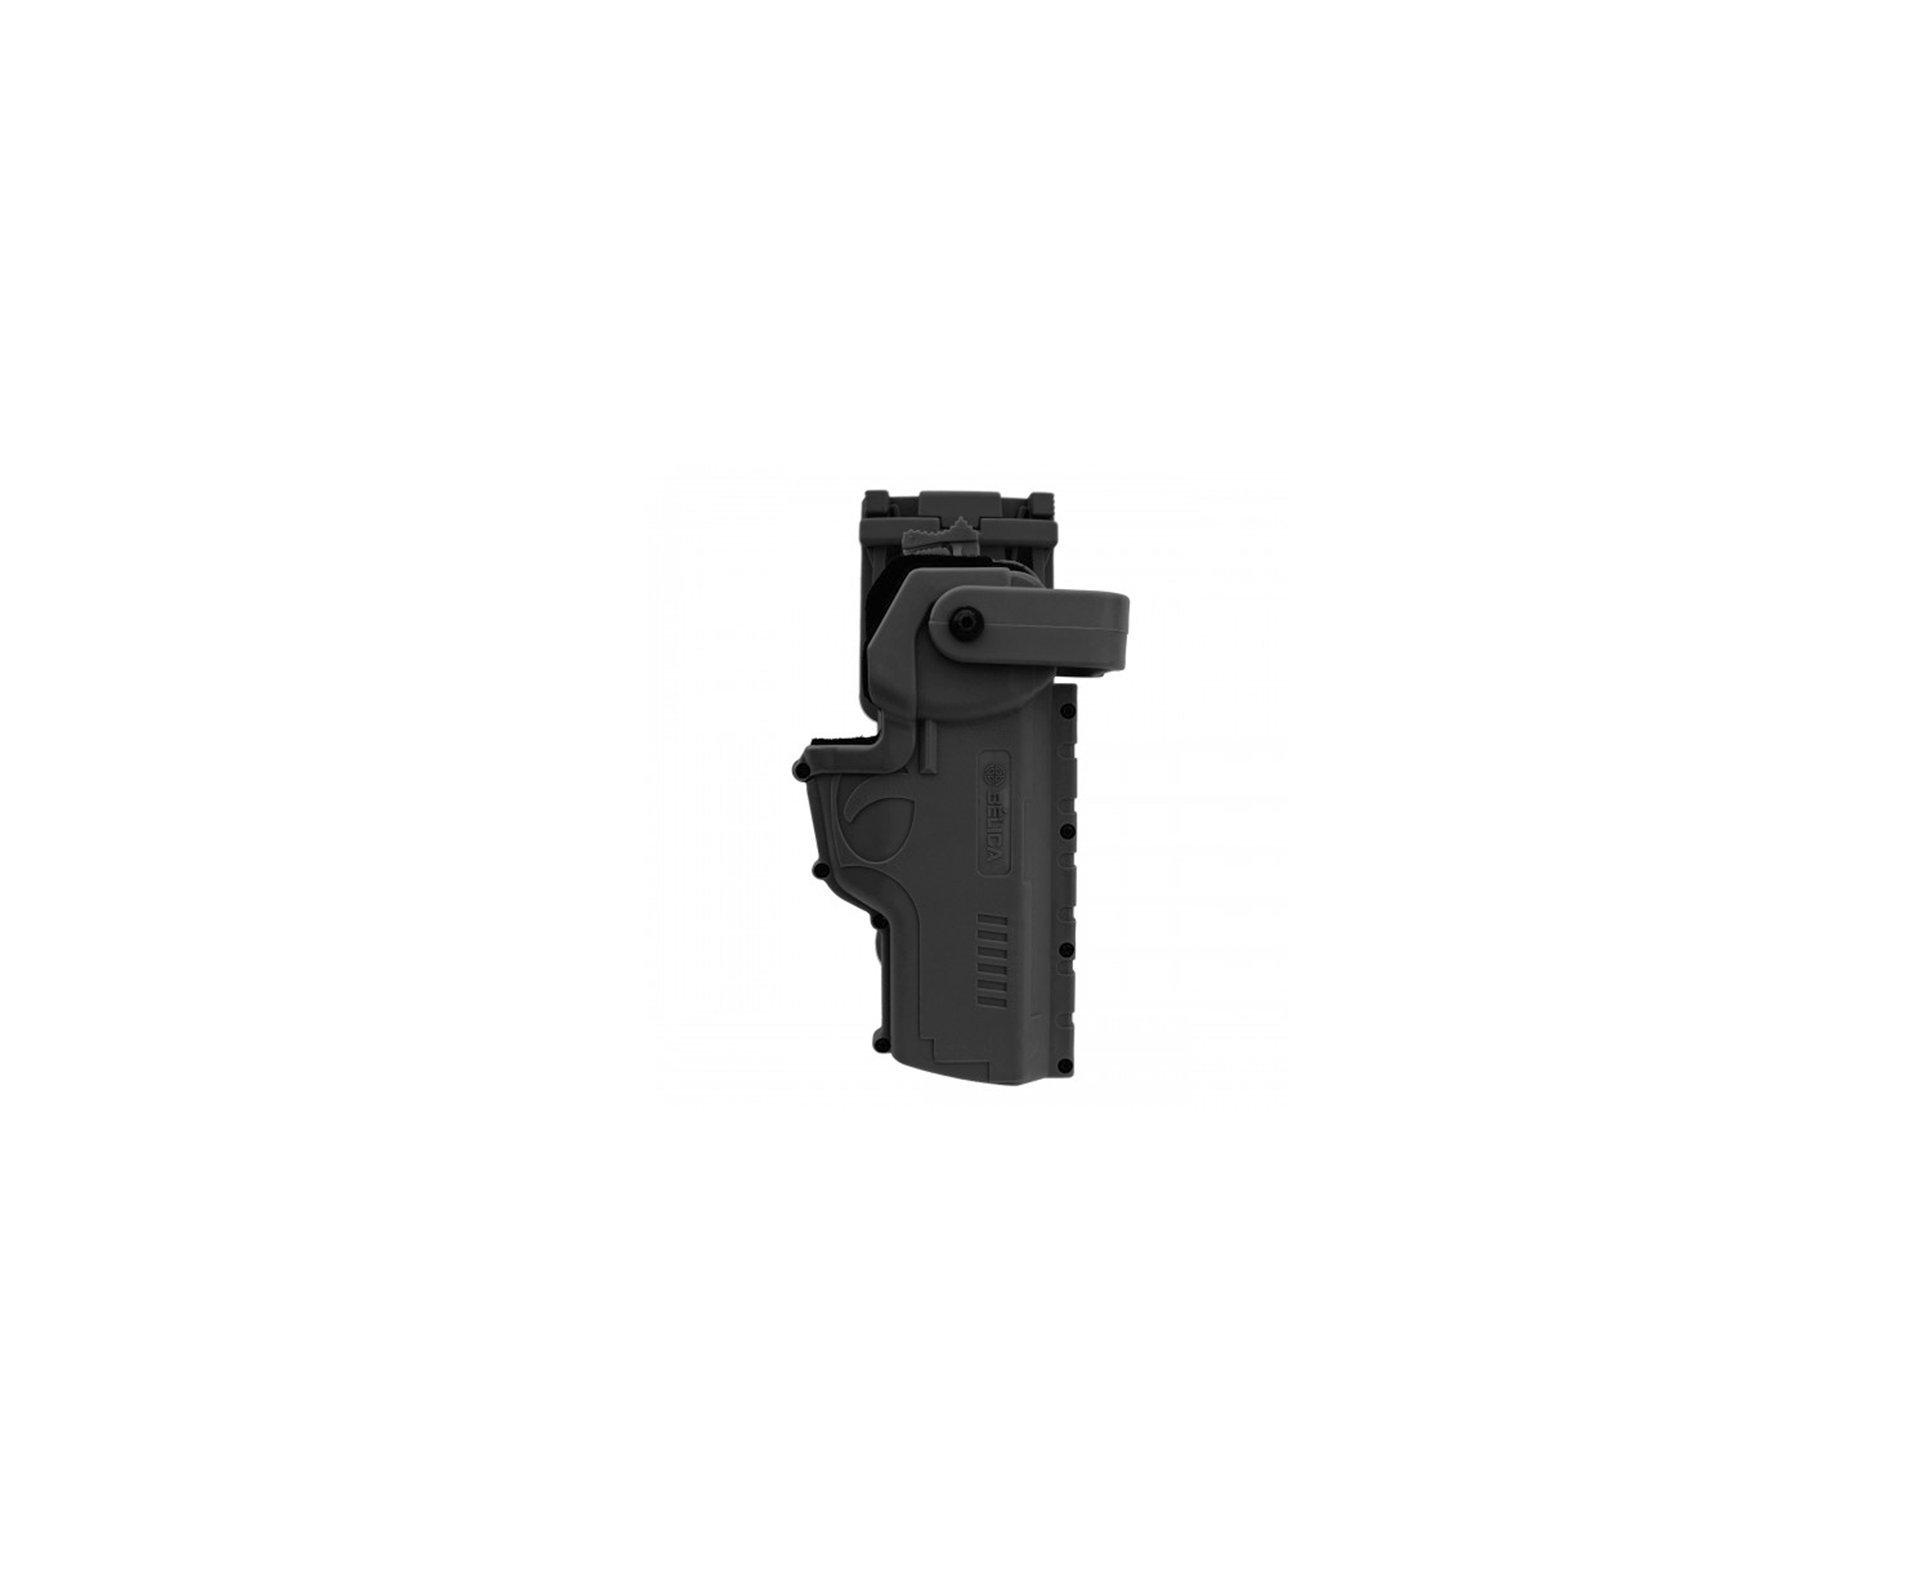 Coldre Hammer I Taurus, Glock, Imbel Destro - Belica